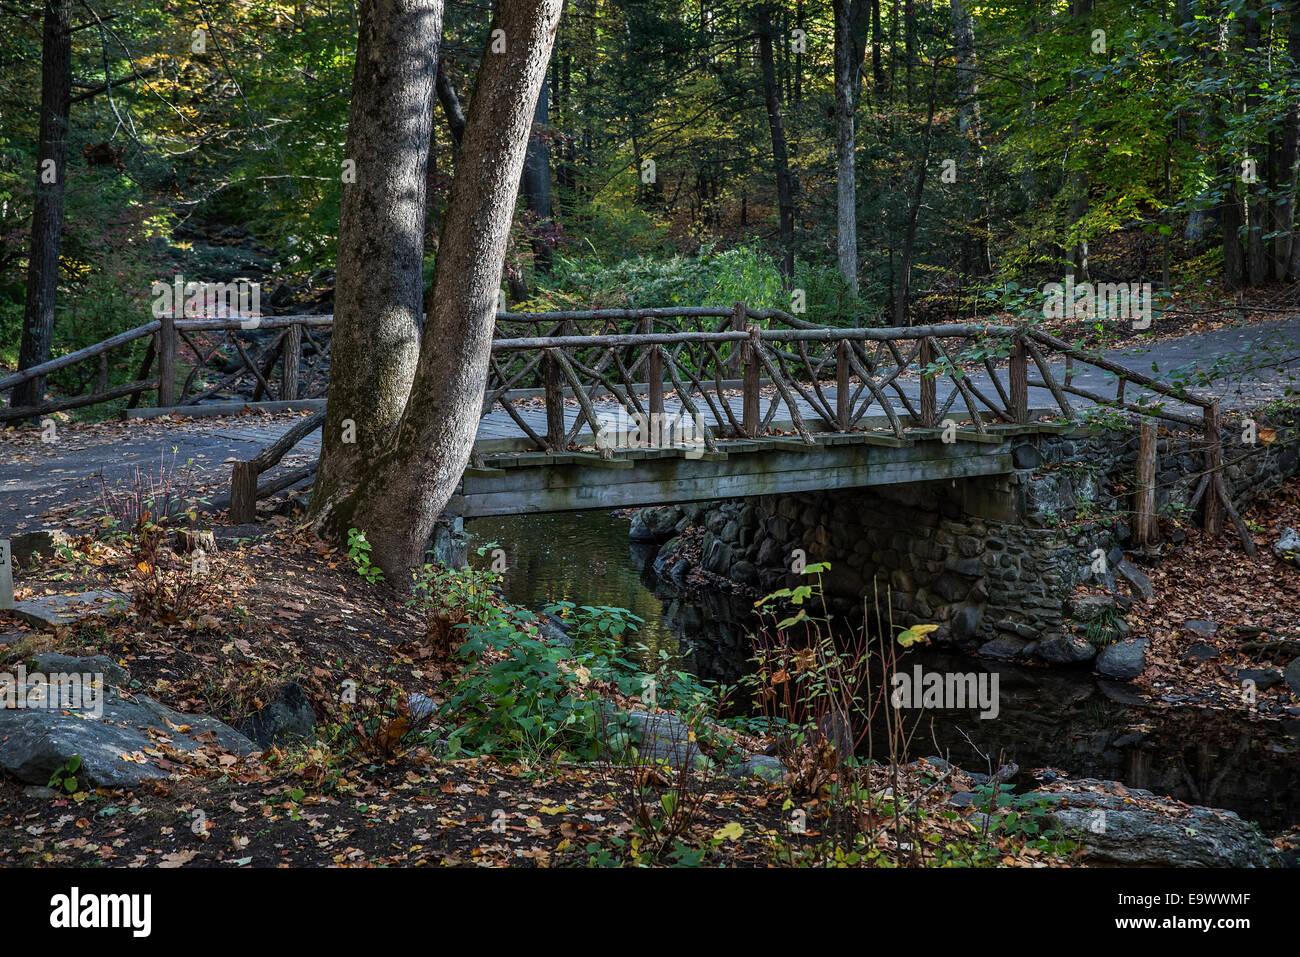 Headless Horseman Bridge, Sleepy Hollow, New York, USA Photo Stock